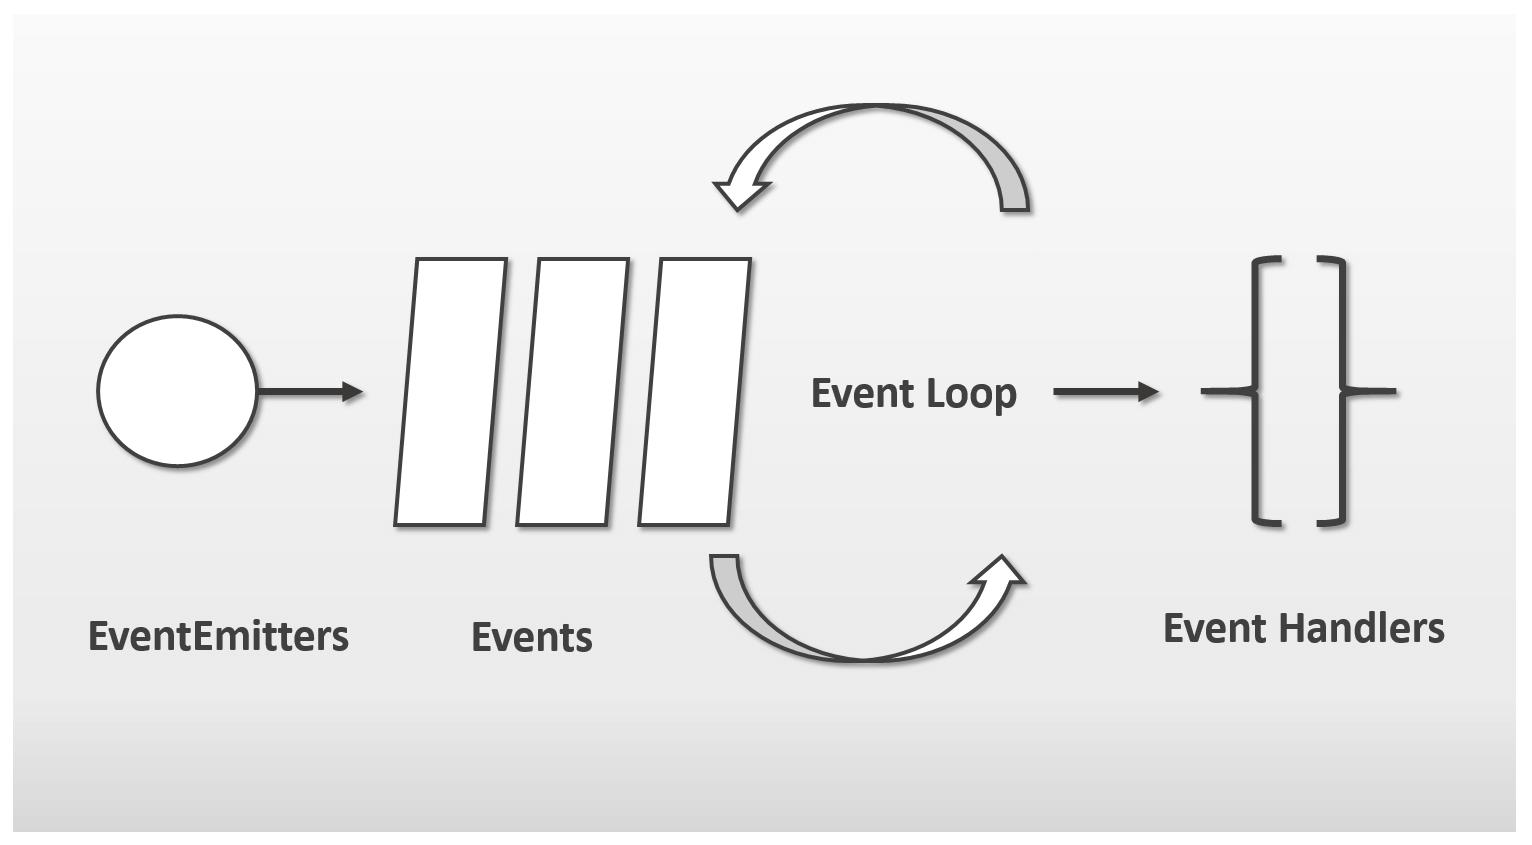 Node.js   Tutorial zu Installation, Modulen & Praxisbeispielen - 1&1